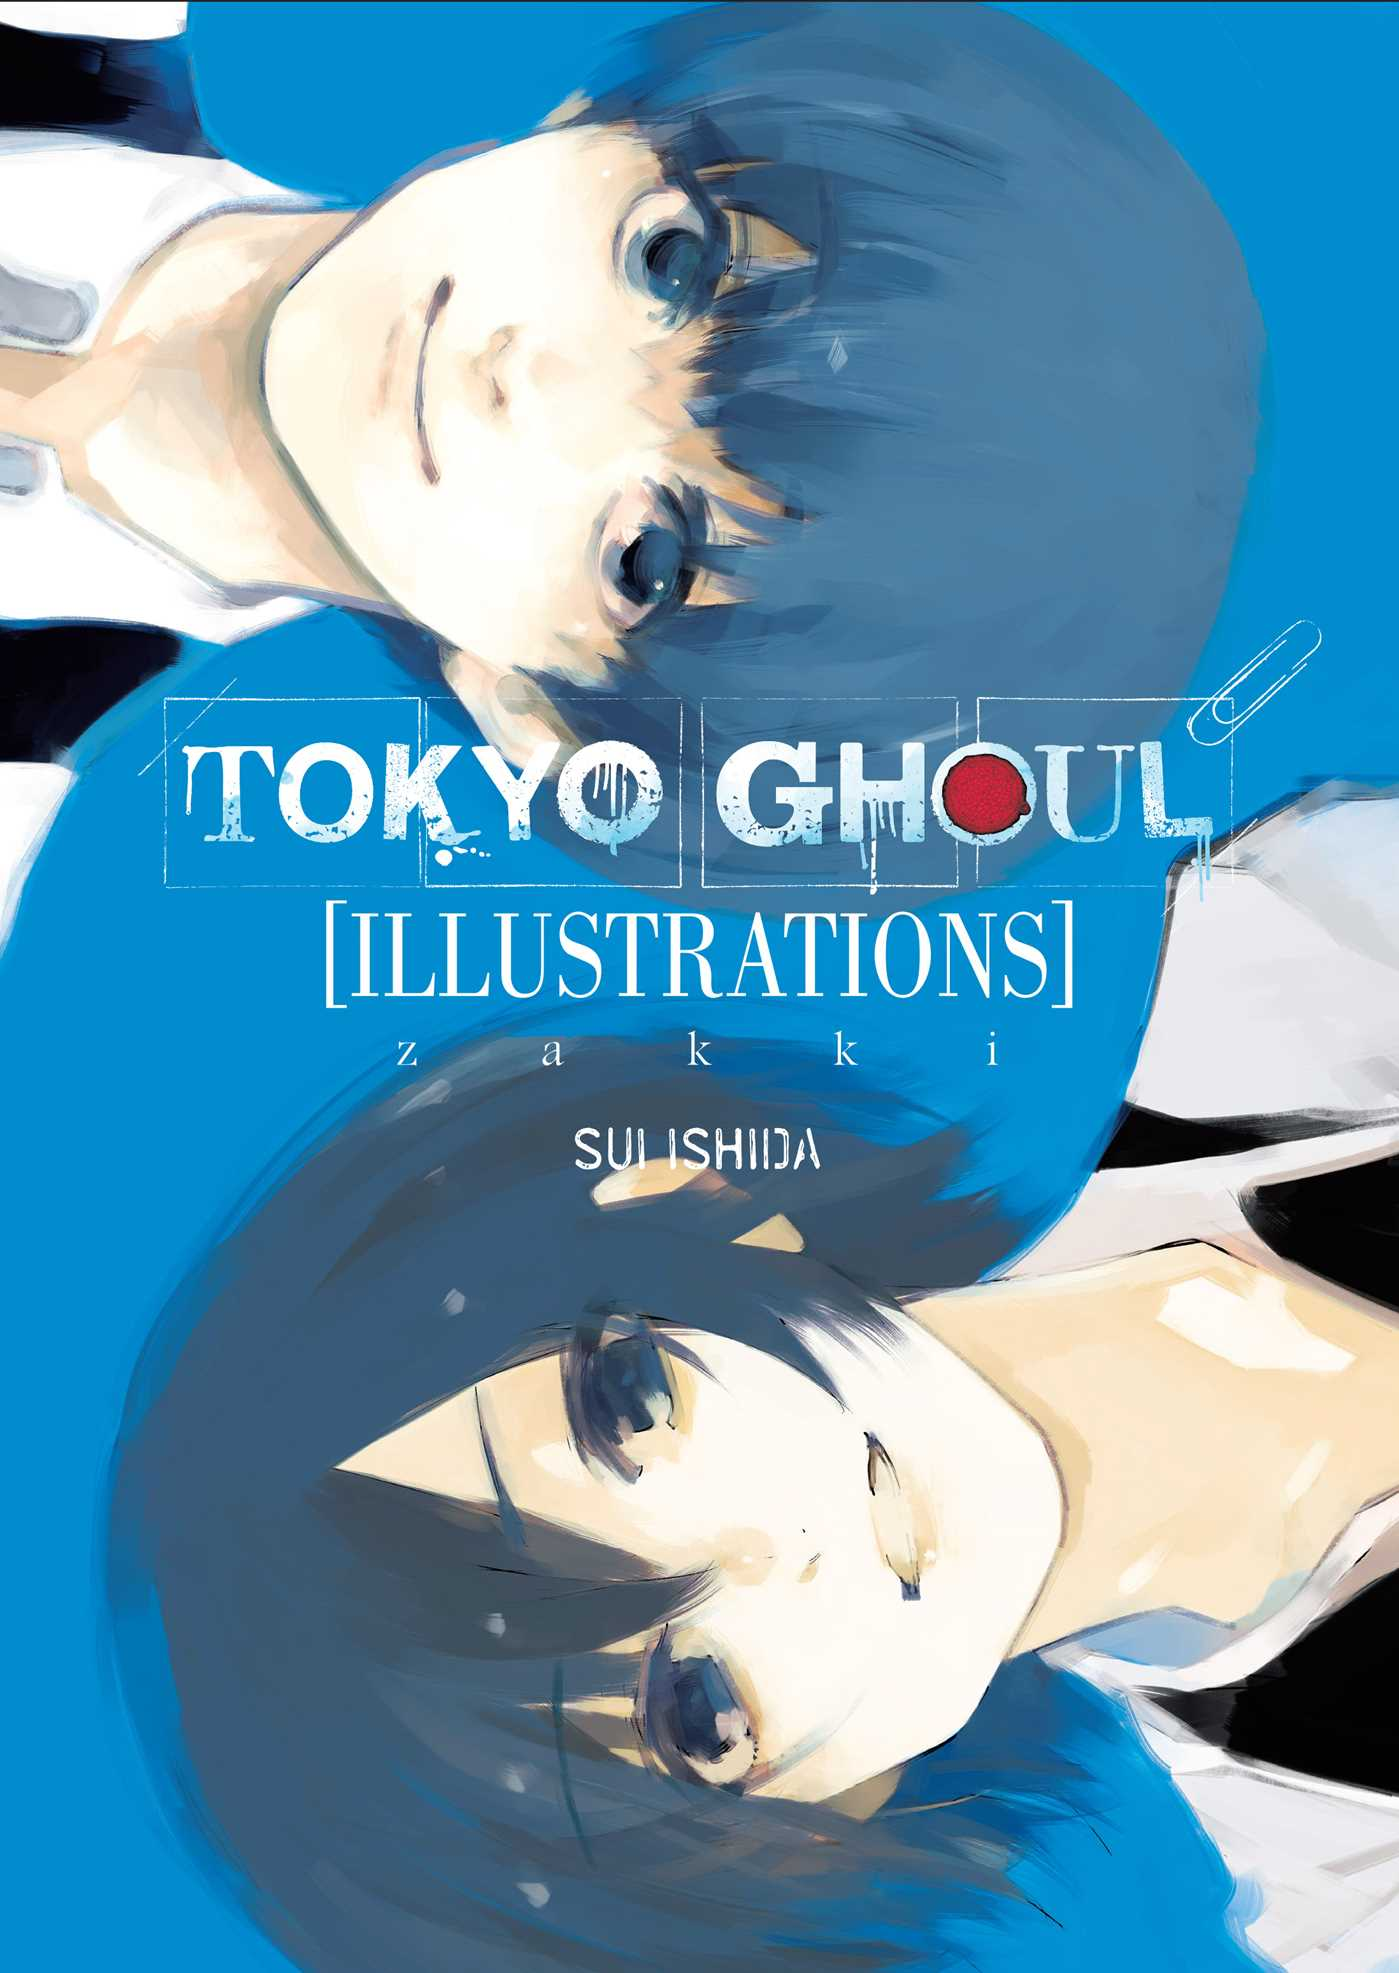 Tokyo Ghoul Illustrations: zakki | Book by Sui Ishida